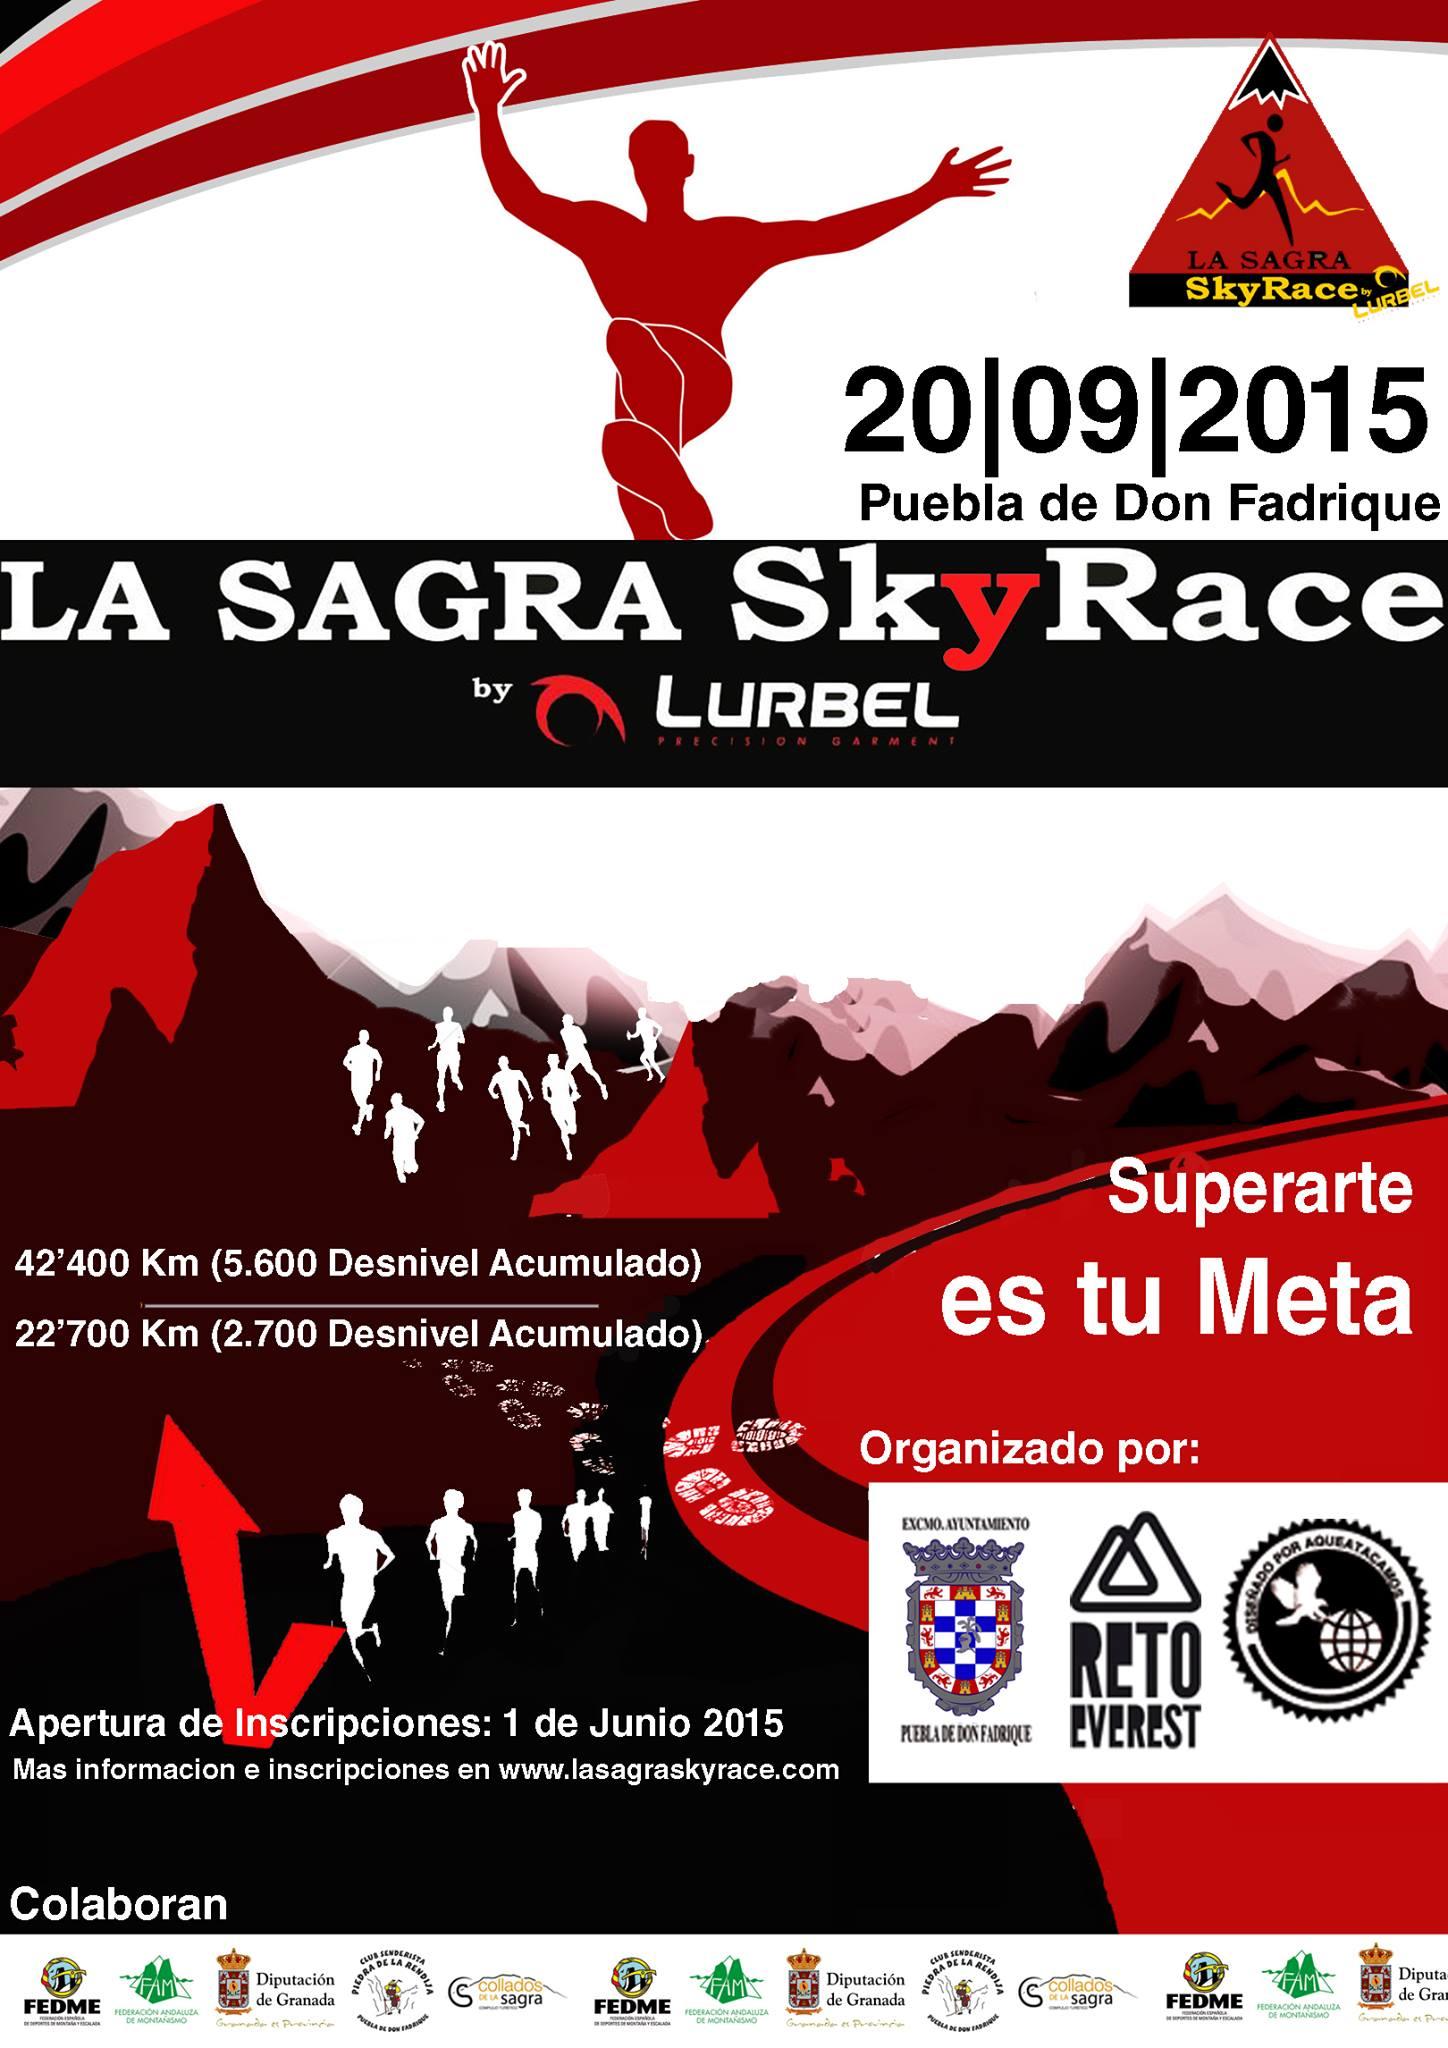 La Sagra Sky Race 2015